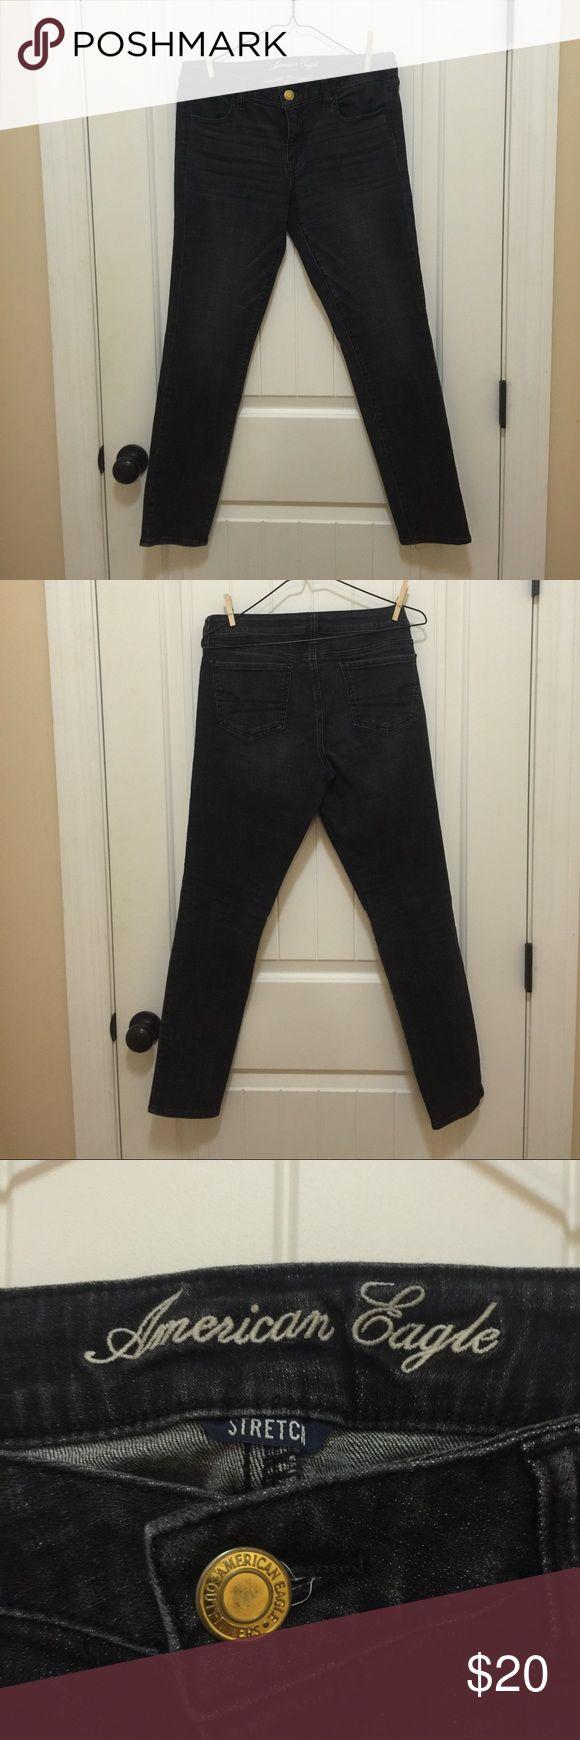 American Eagle Women's Jeggings Black pair of jeggings American Eagle Outfitters Jeans Skinny